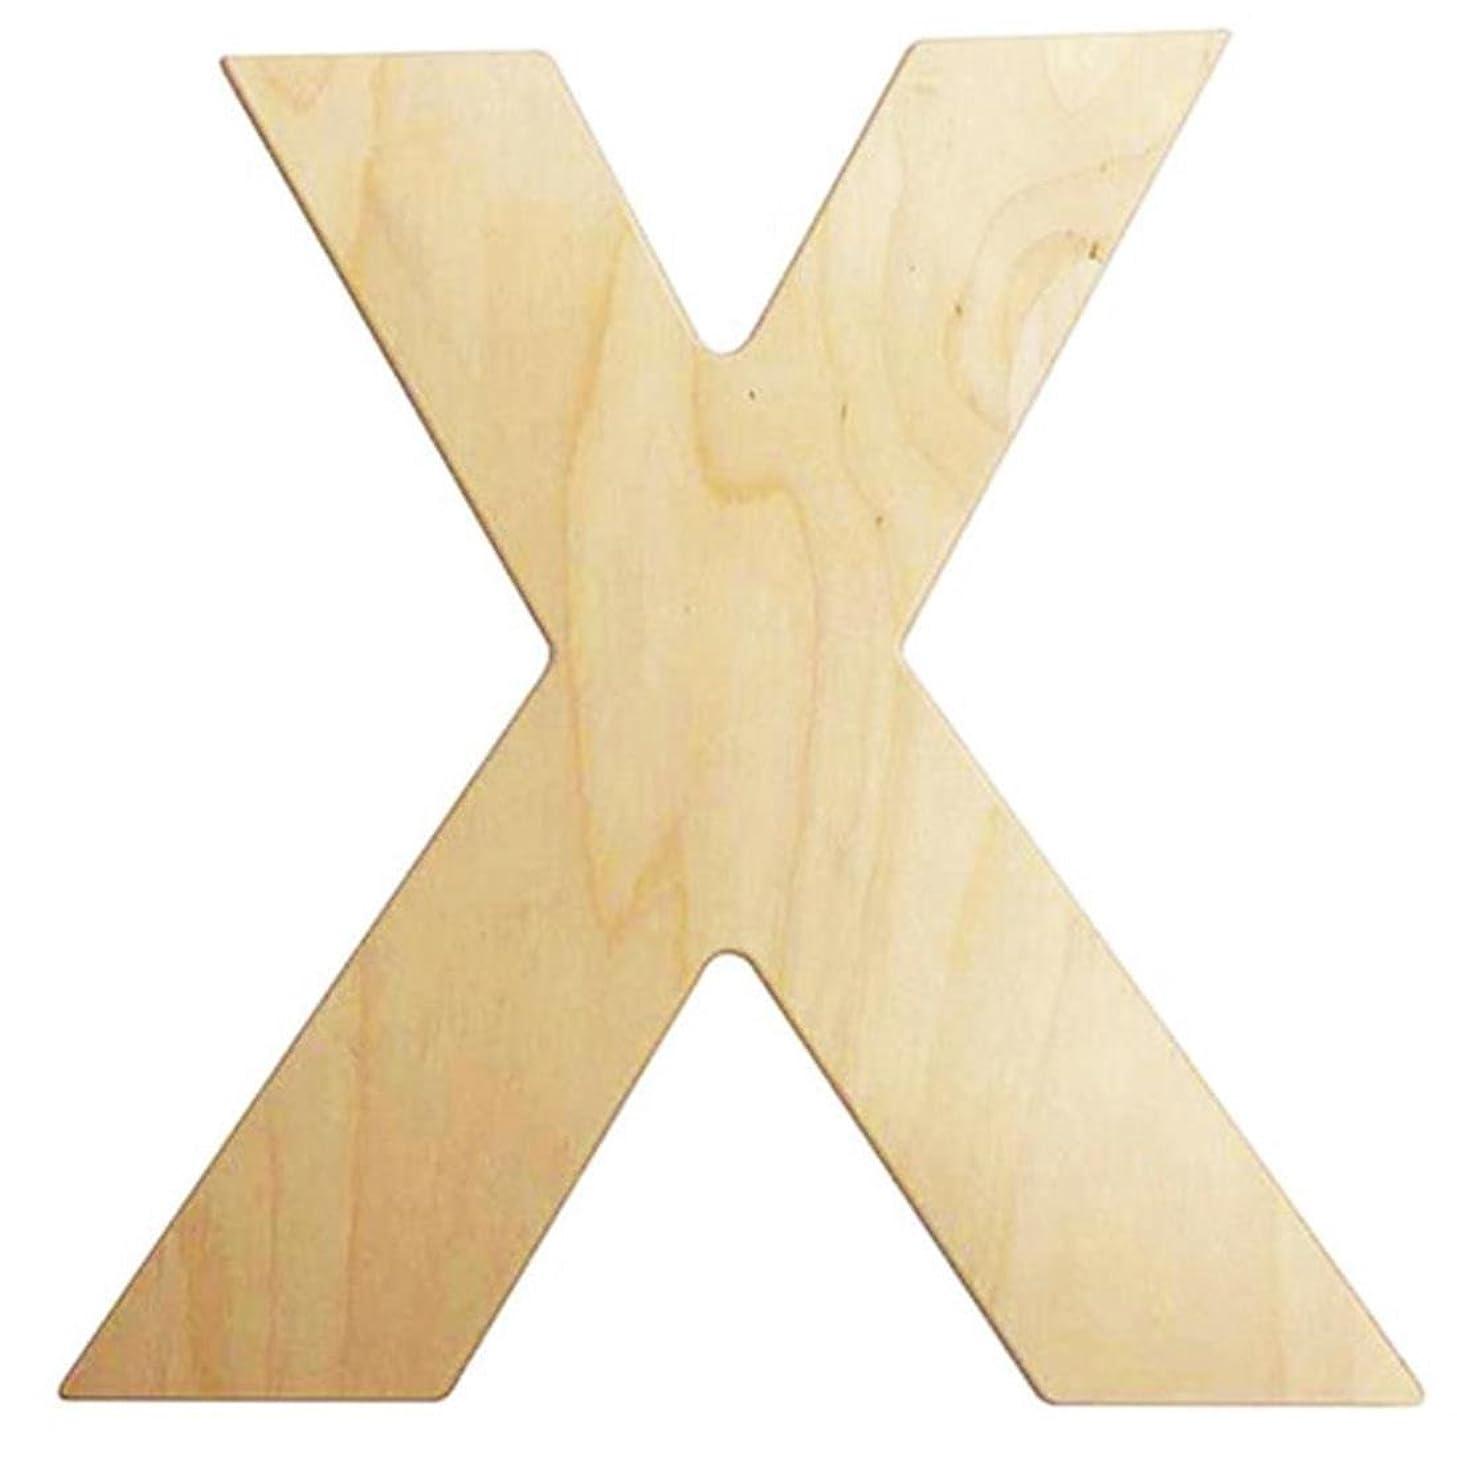 DARICE U0993-X 12IN. Wood Letter X, Multicolor